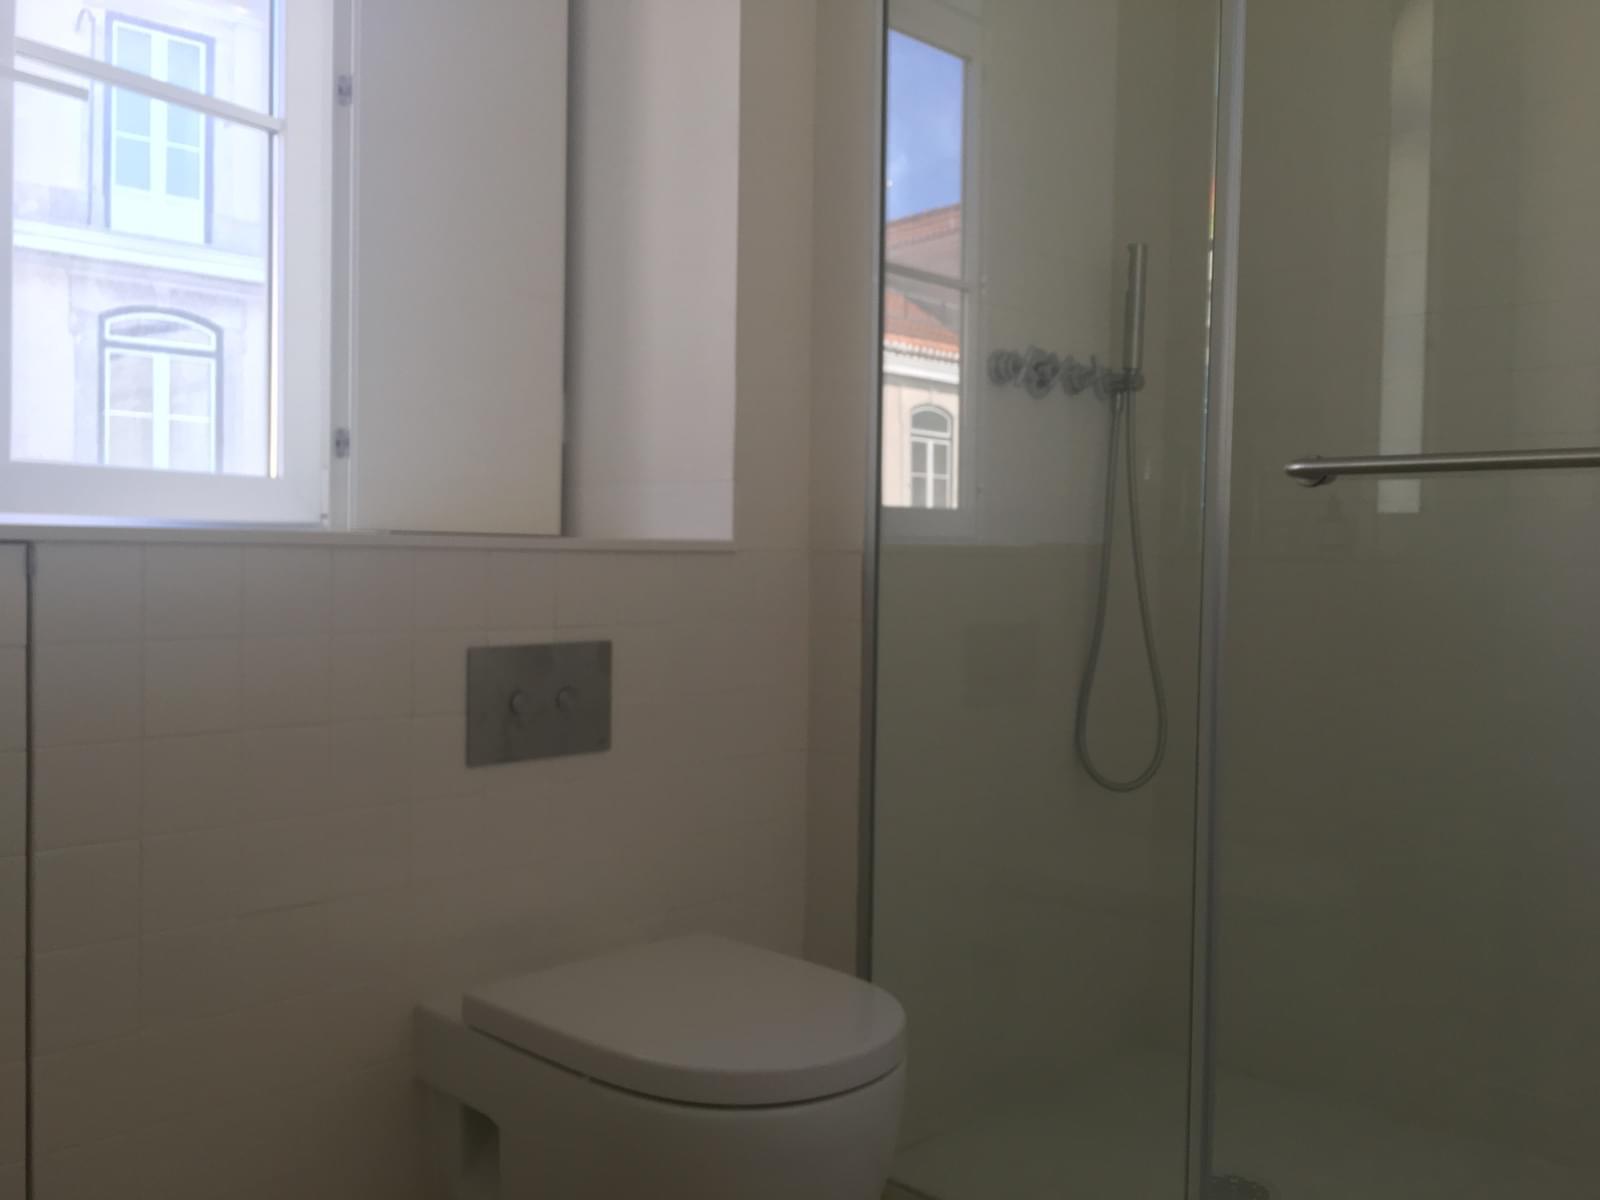 pf17866-apartamento-t1-lisboa-92bd8ed7-c26b-43ca-b043-9e9510a26a89